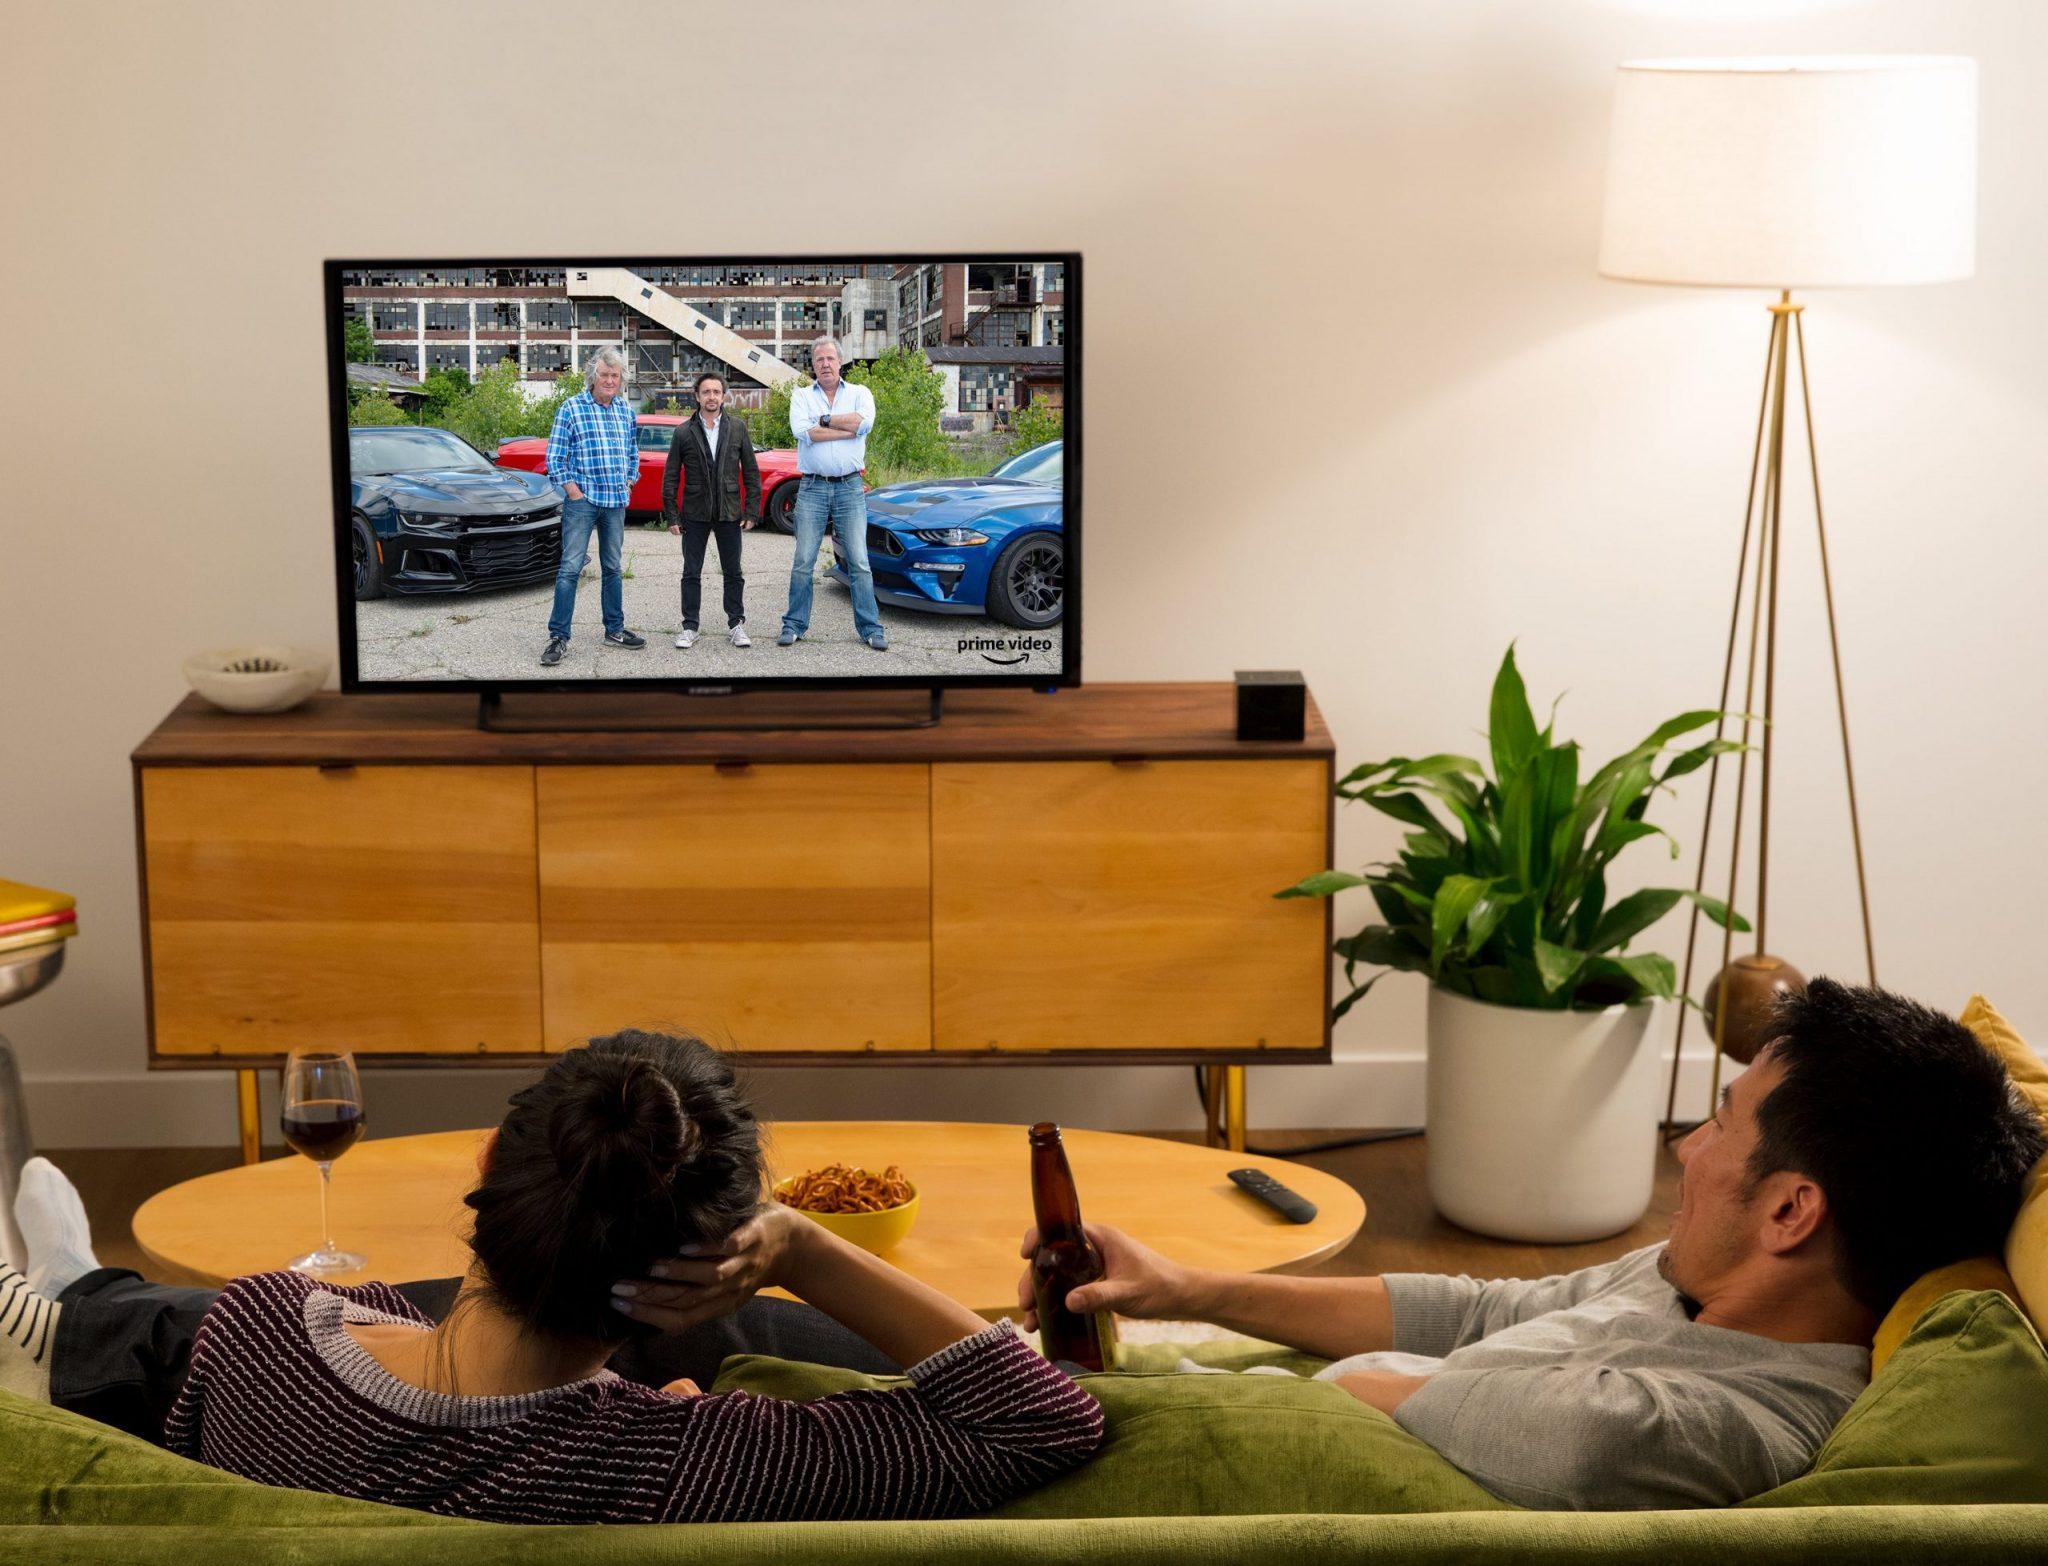 Fire TV Cube, £109.99 - Amazon.co.uk(3)